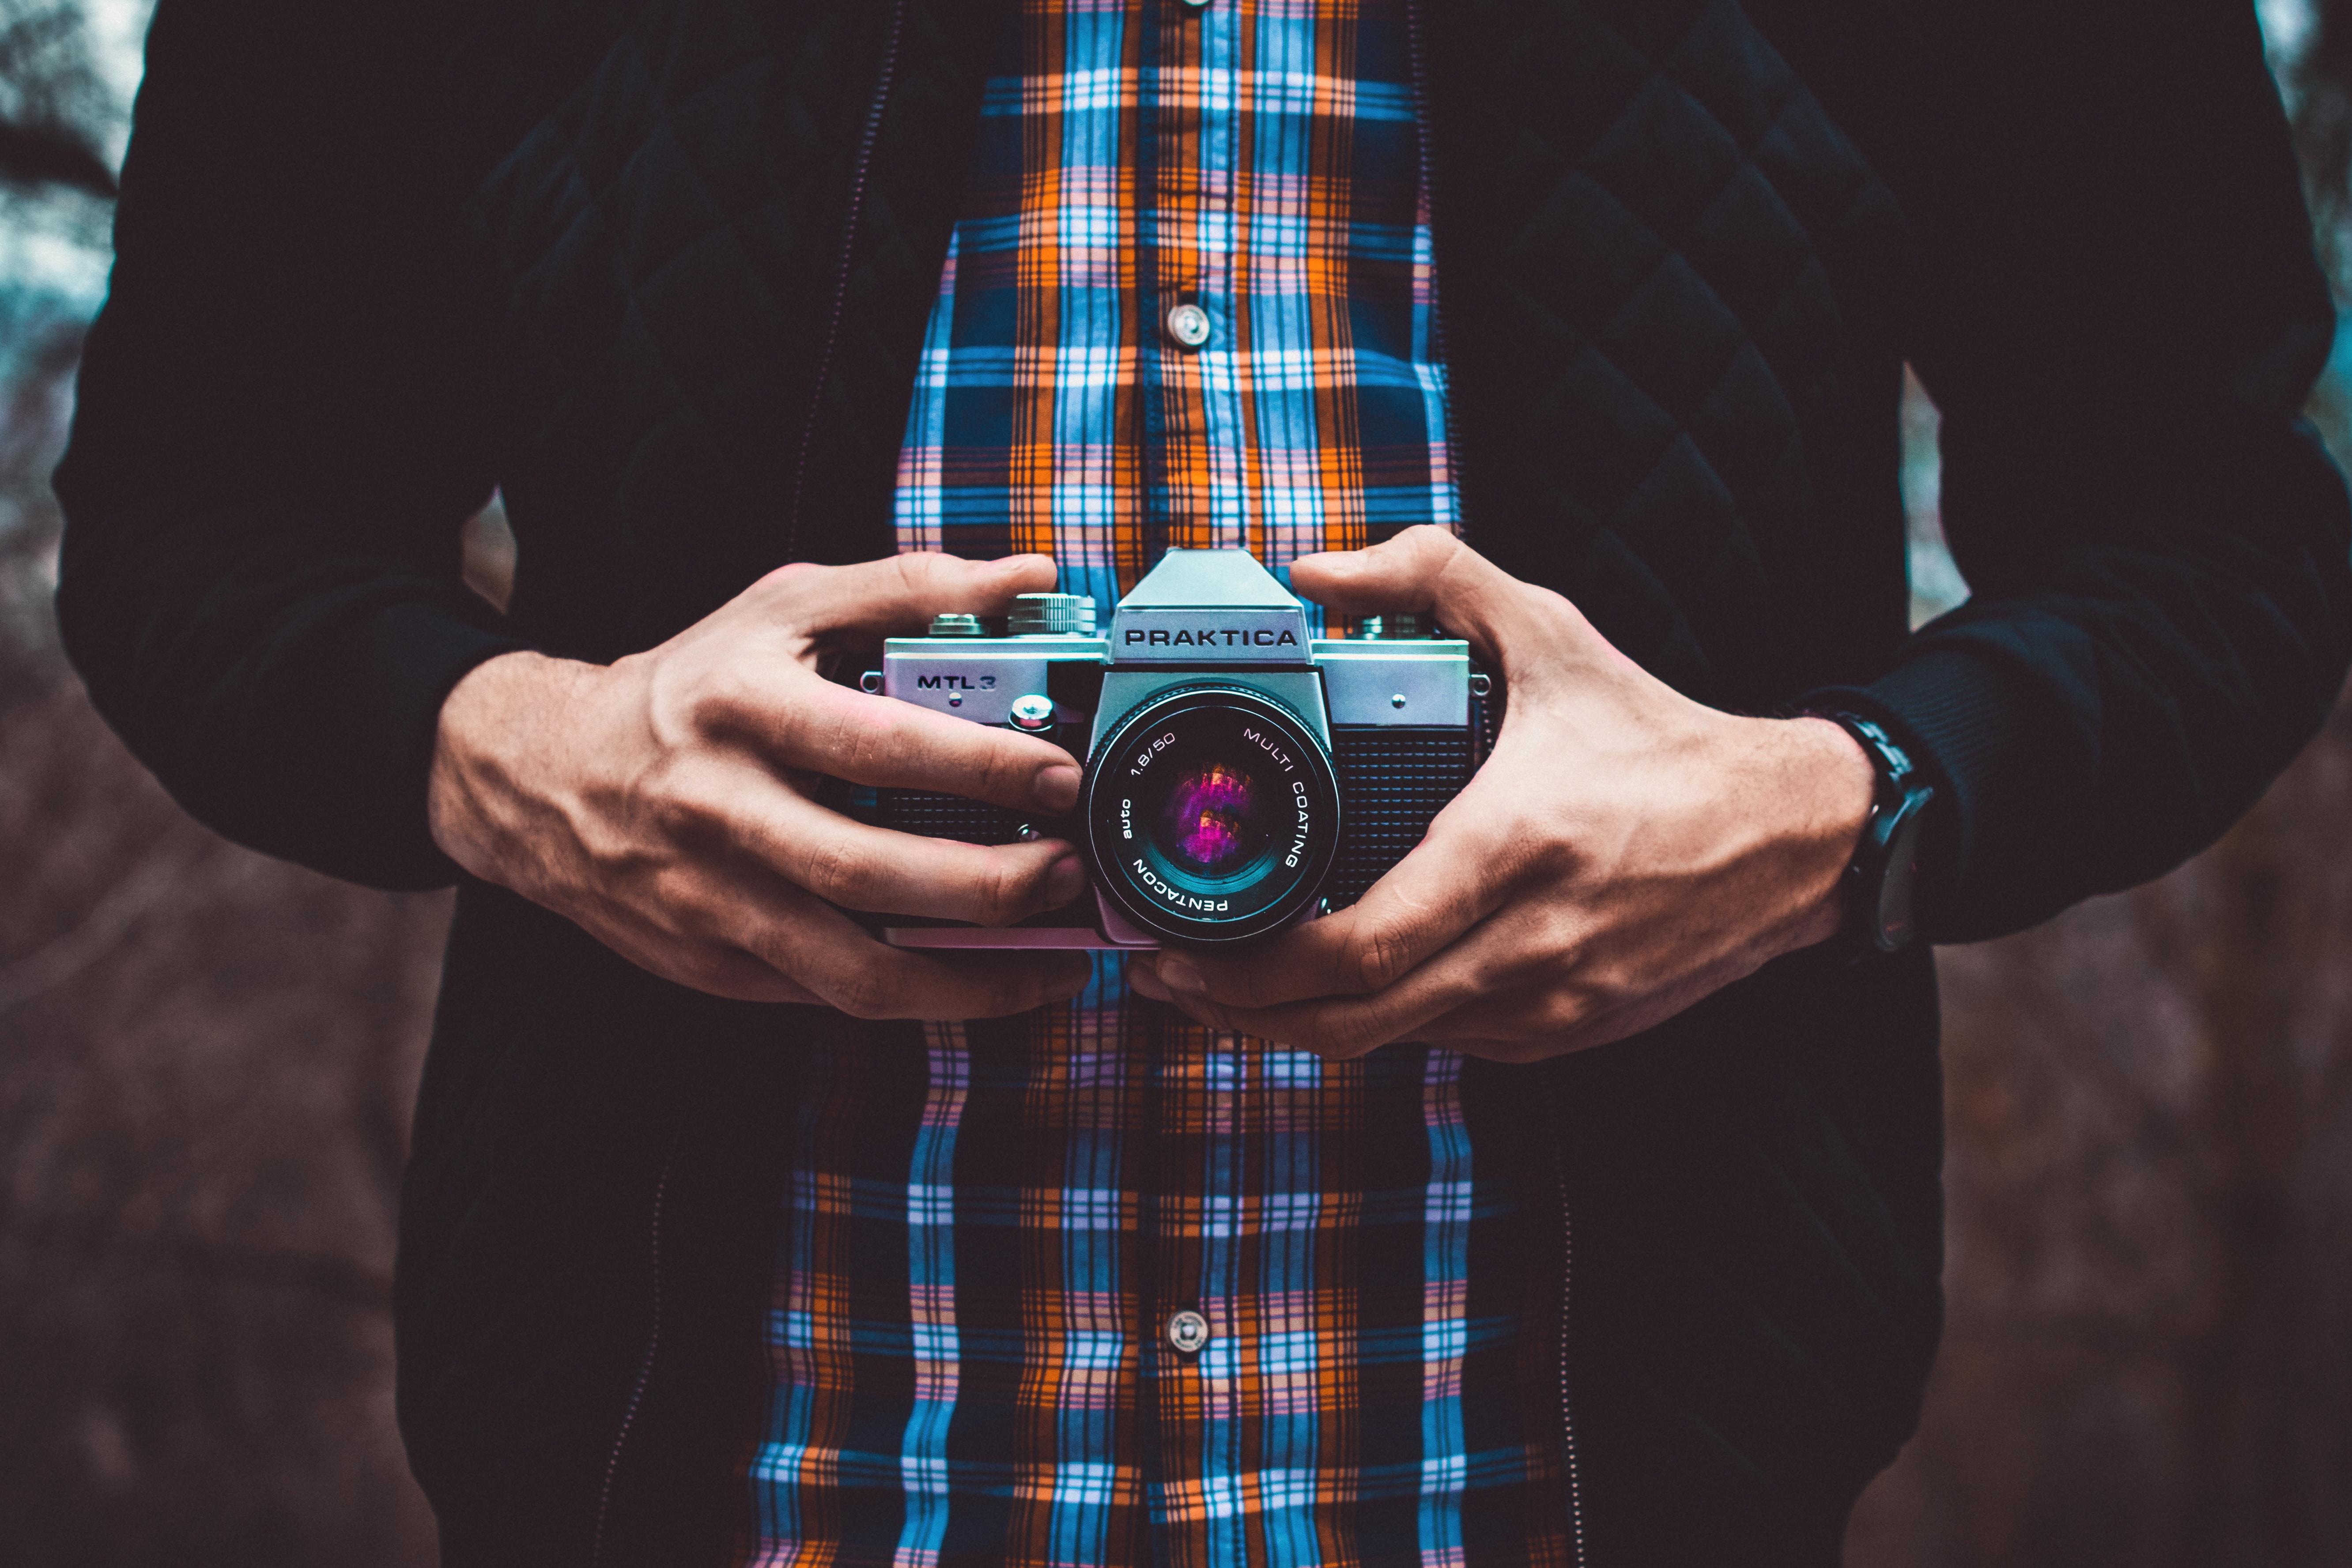 person holding mirrorless camera